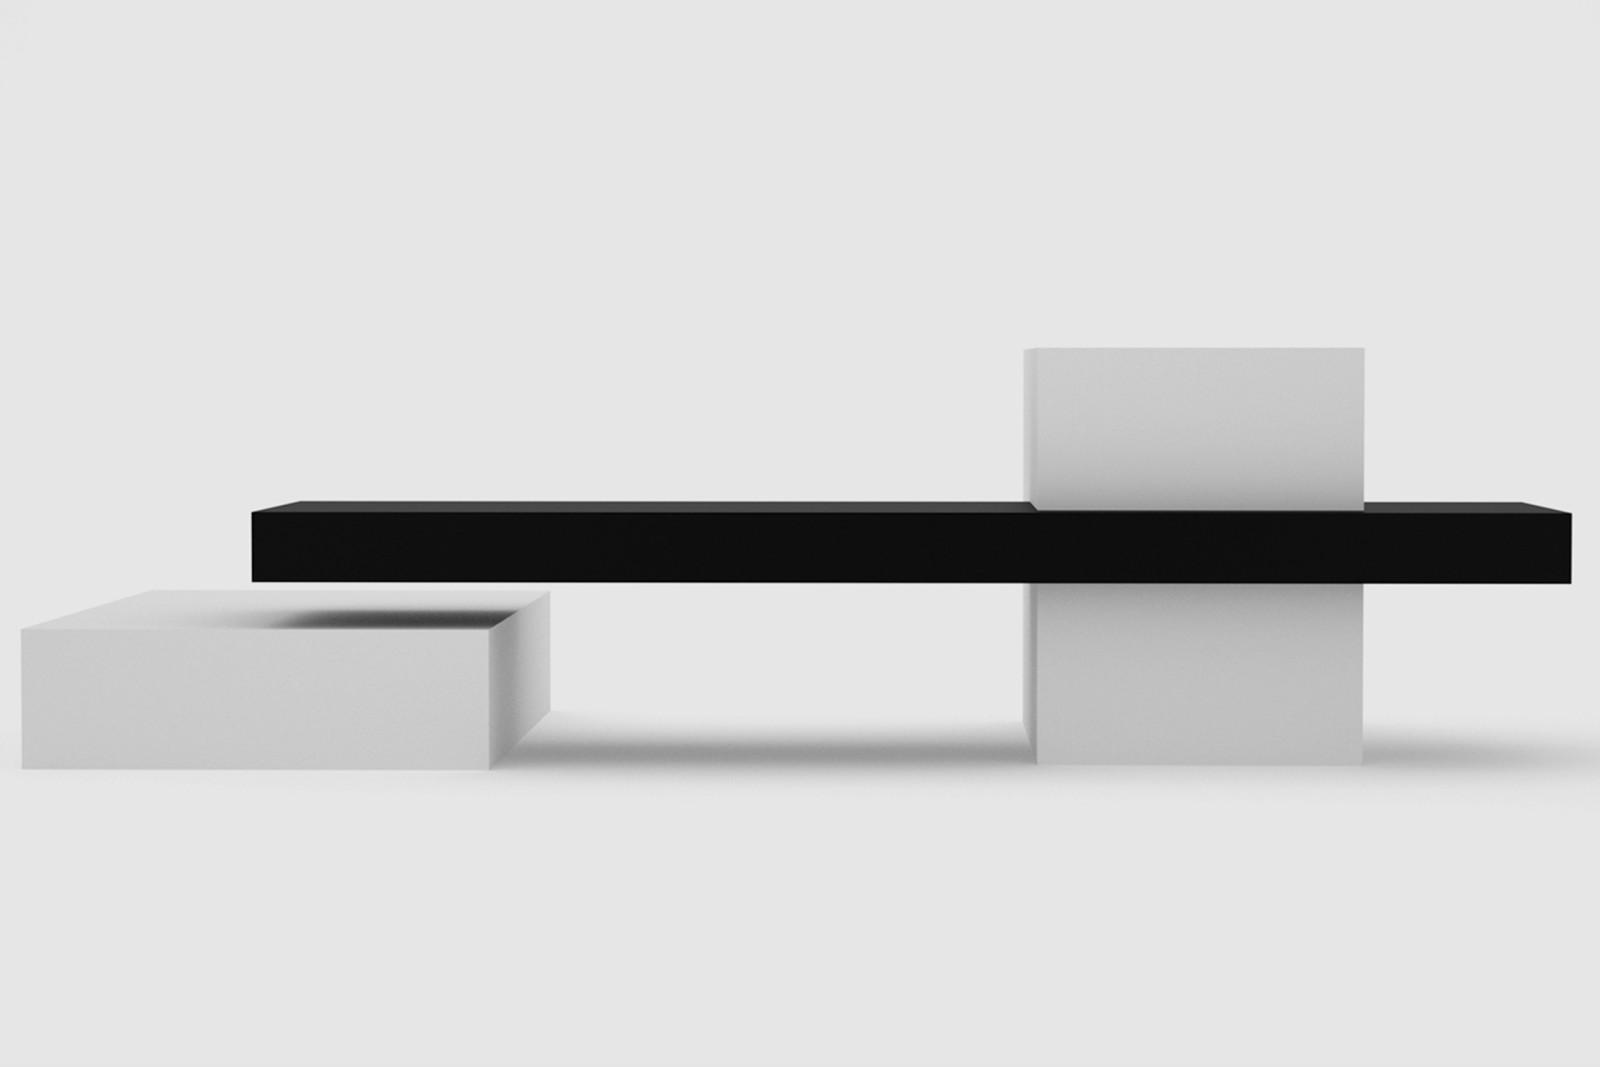 Norwegian Design Pavilion for the Norwegian Consulate General